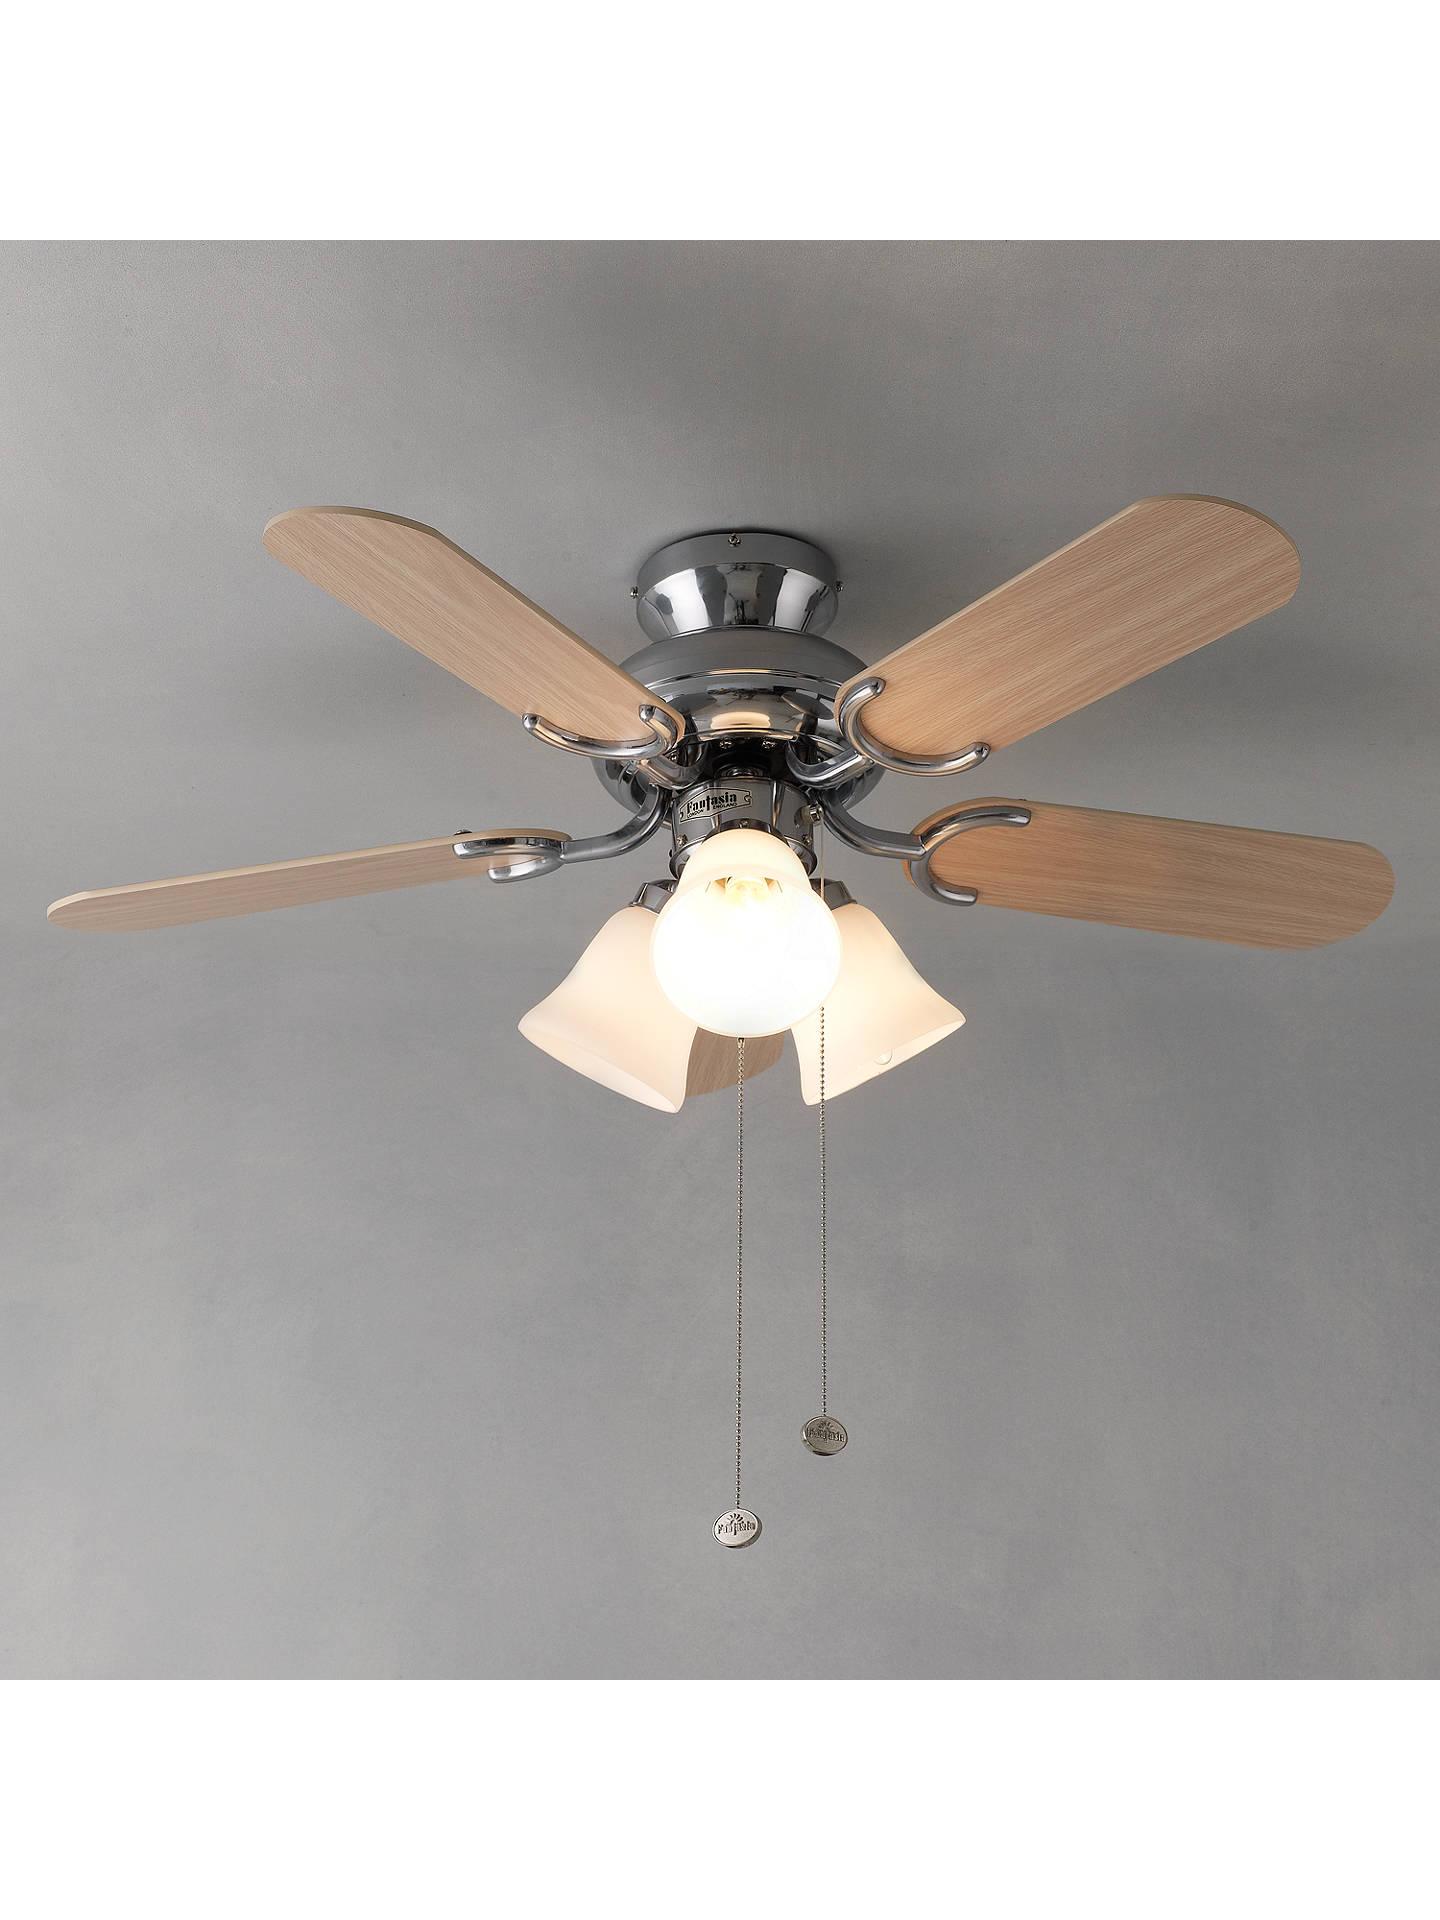 fantasia capri ceiling fan and light oak at john lewis. Black Bedroom Furniture Sets. Home Design Ideas